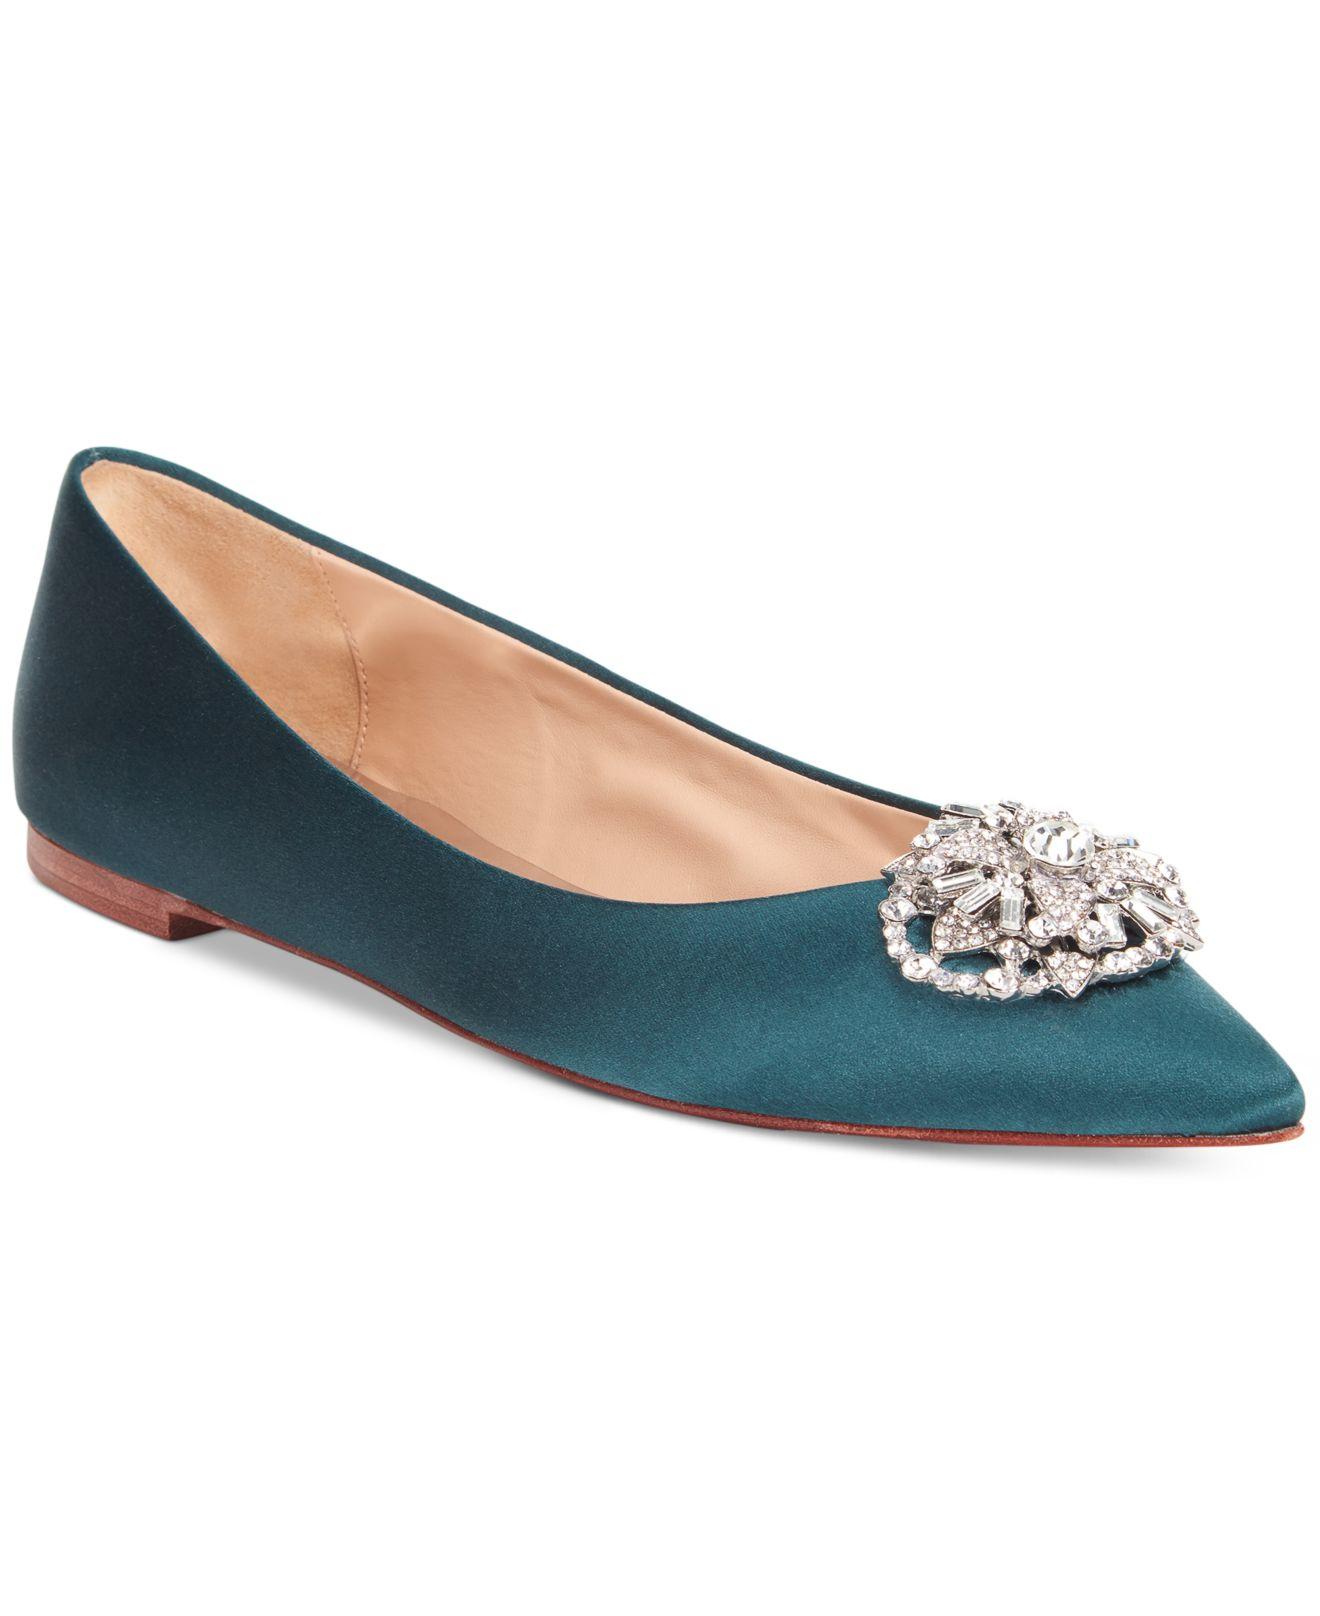 Badgley Mischka Blue Shoes Sale